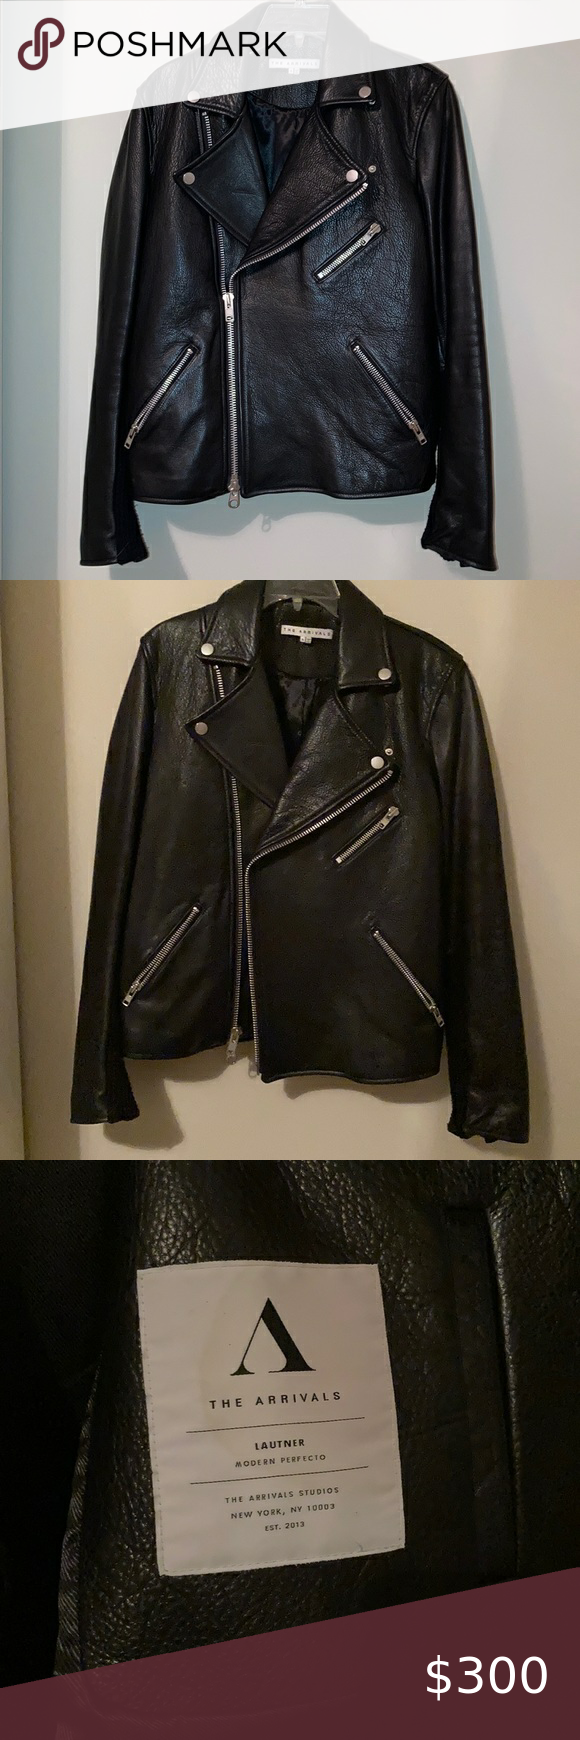 The Arrivals The Lautner Black Leather Jacket Leather Jacket Black Leather Jacket Vegan Leather Moto Jacket [ 1740 x 580 Pixel ]